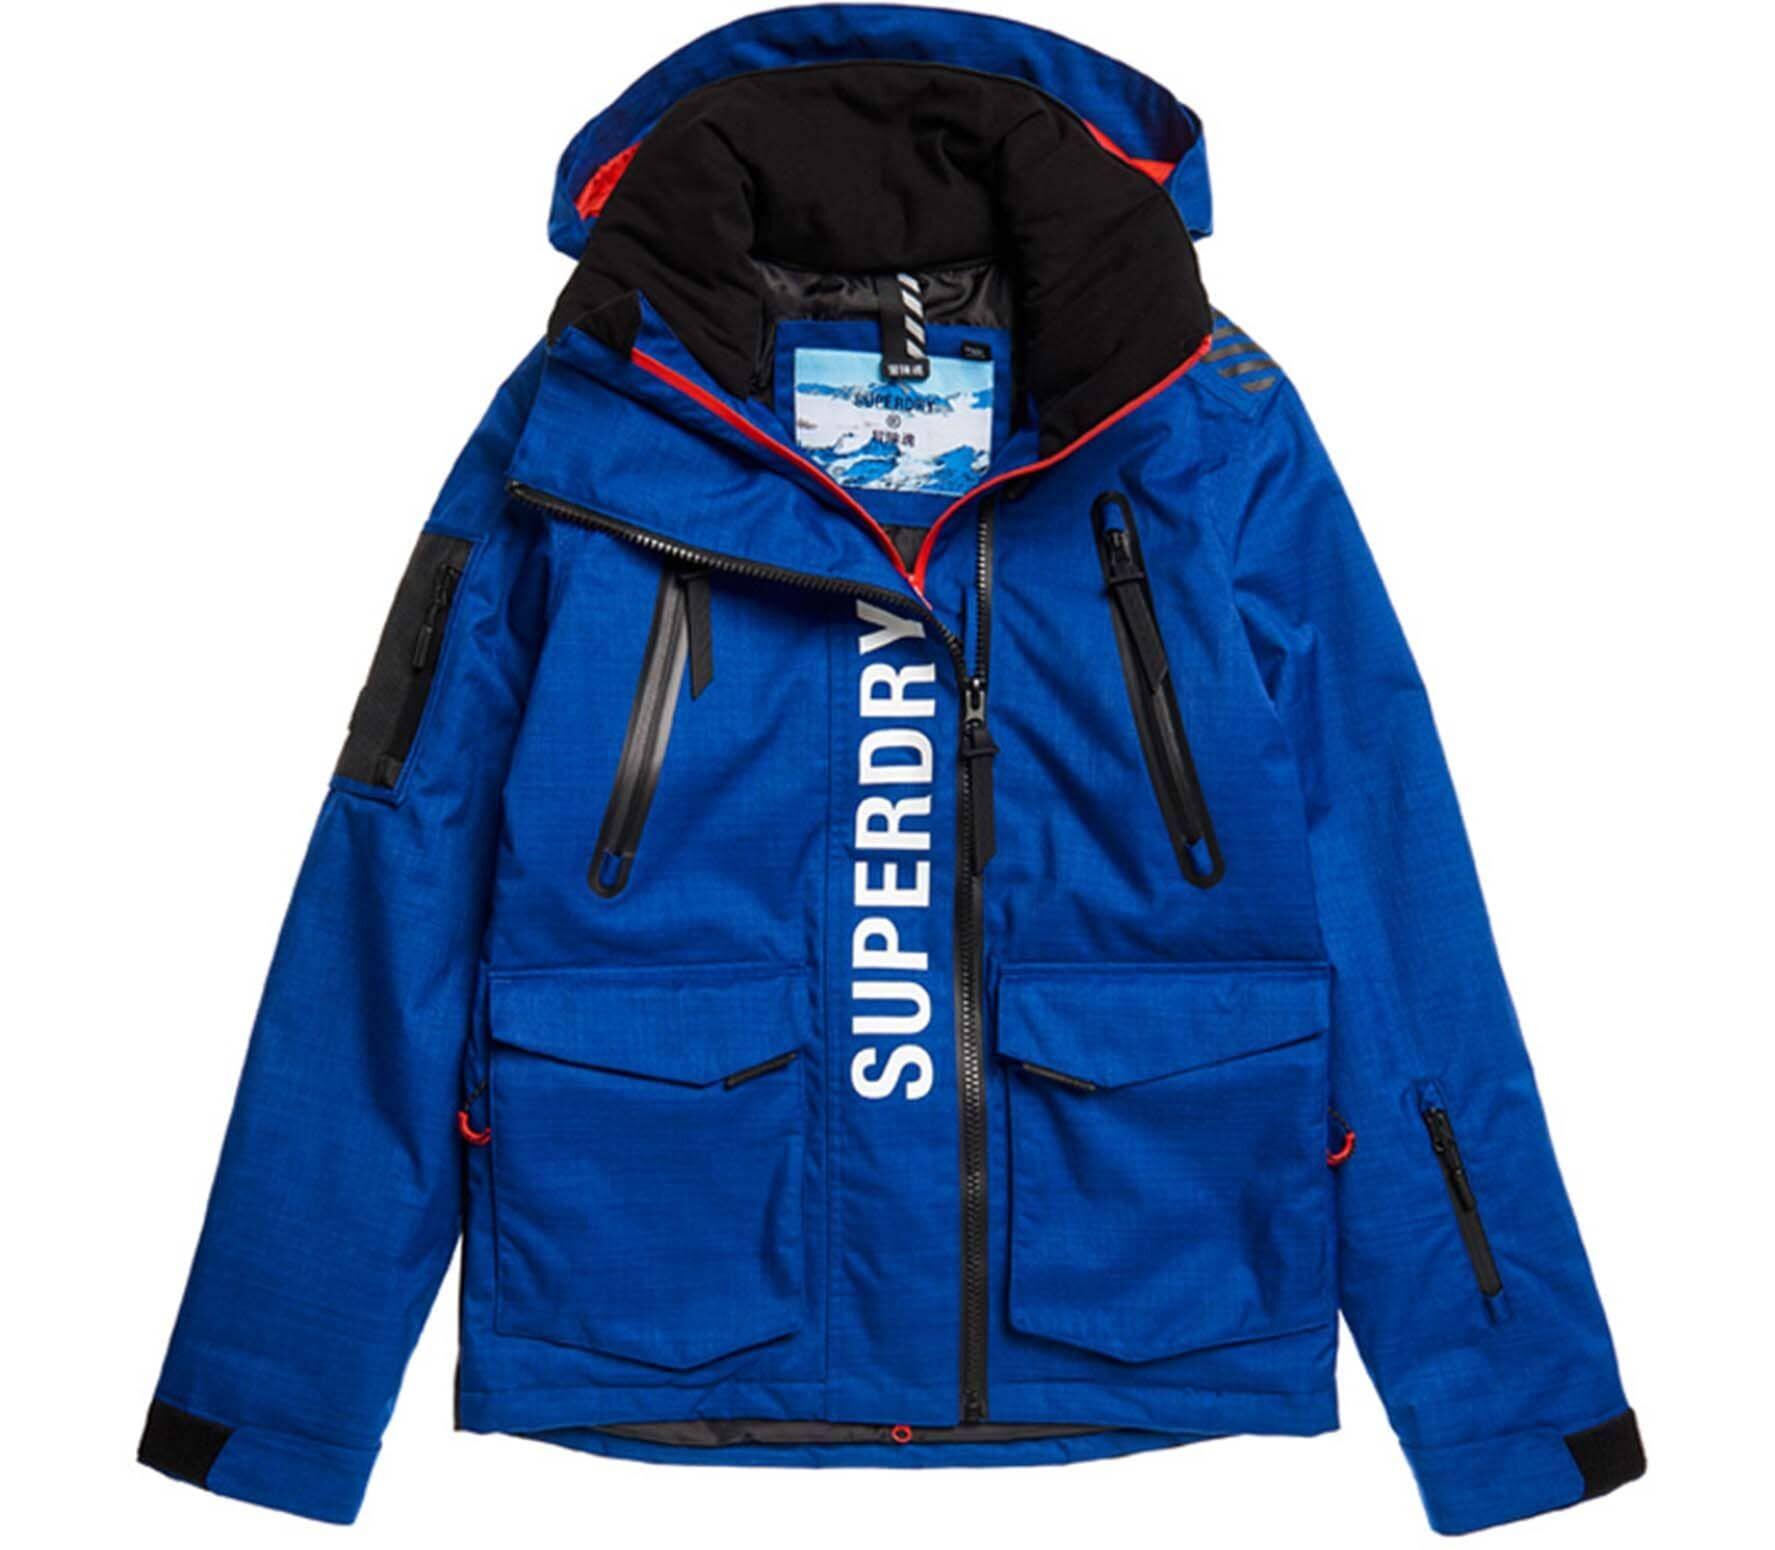 SUPERDRY SPORT® Ultimate Mountain Rescue Herr Skidjacka 52